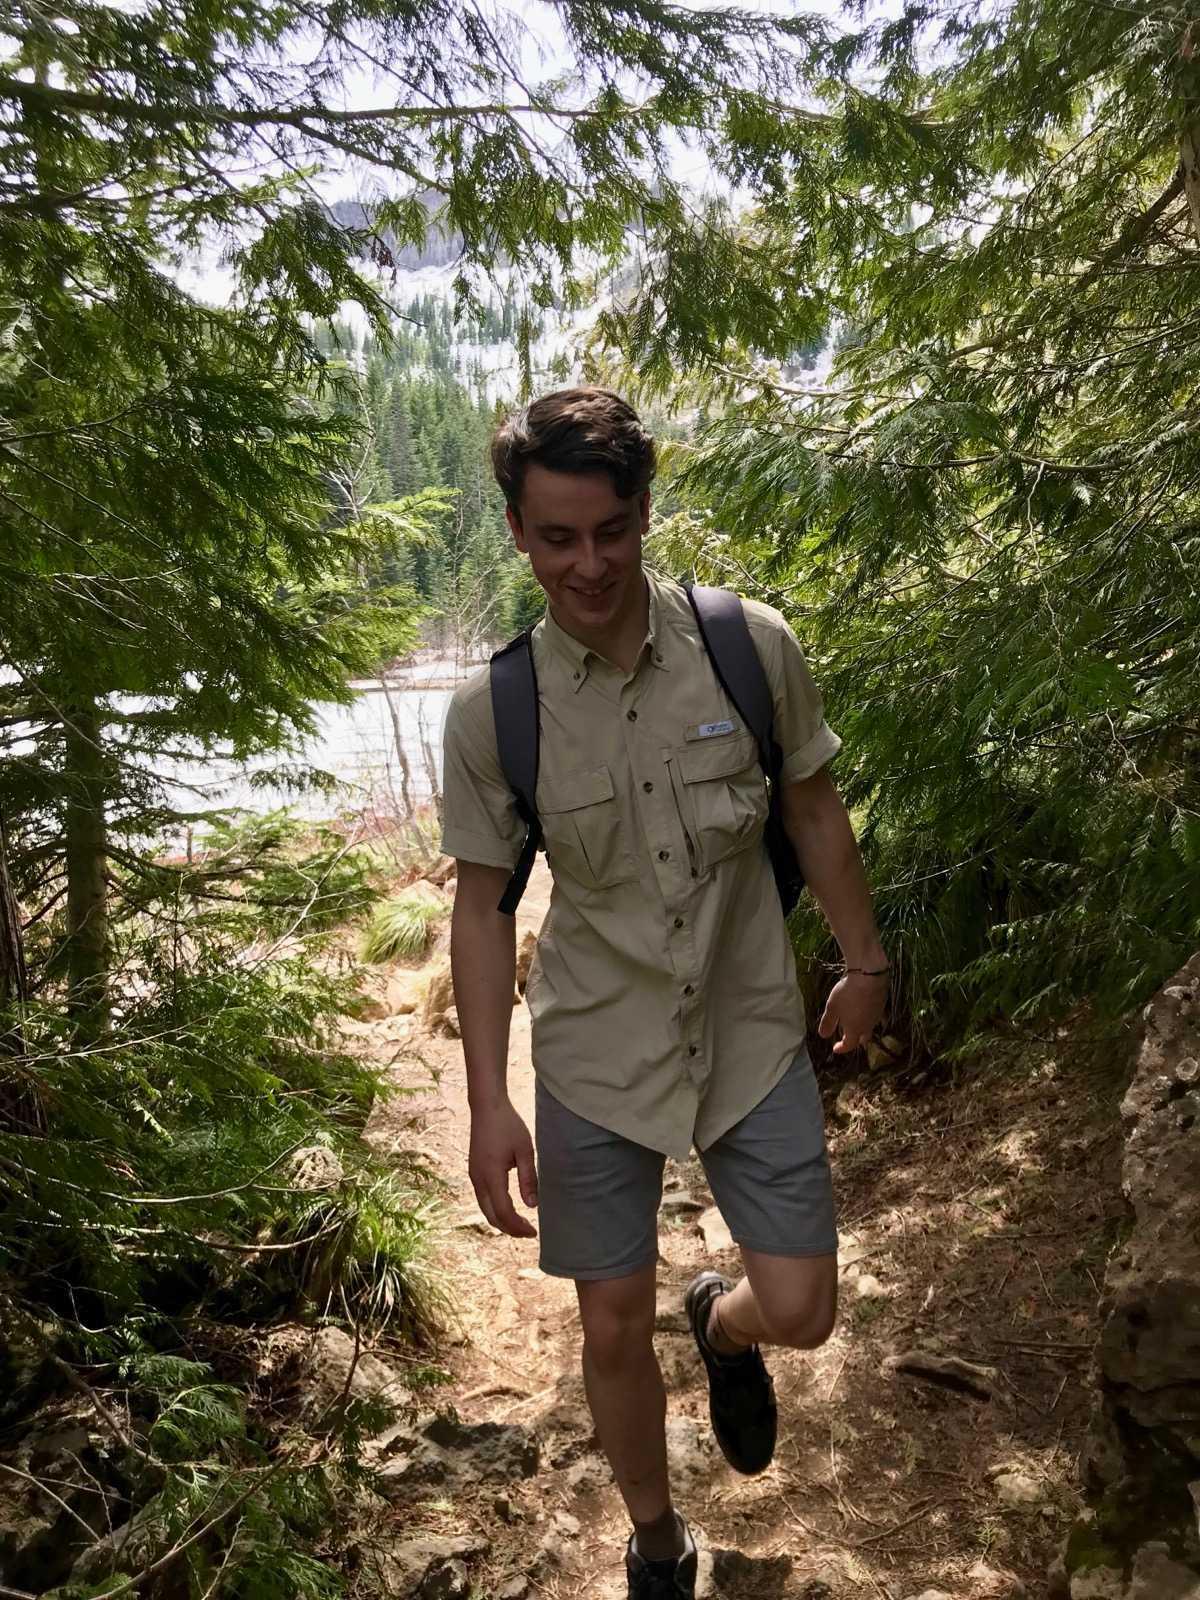 Graham hiking